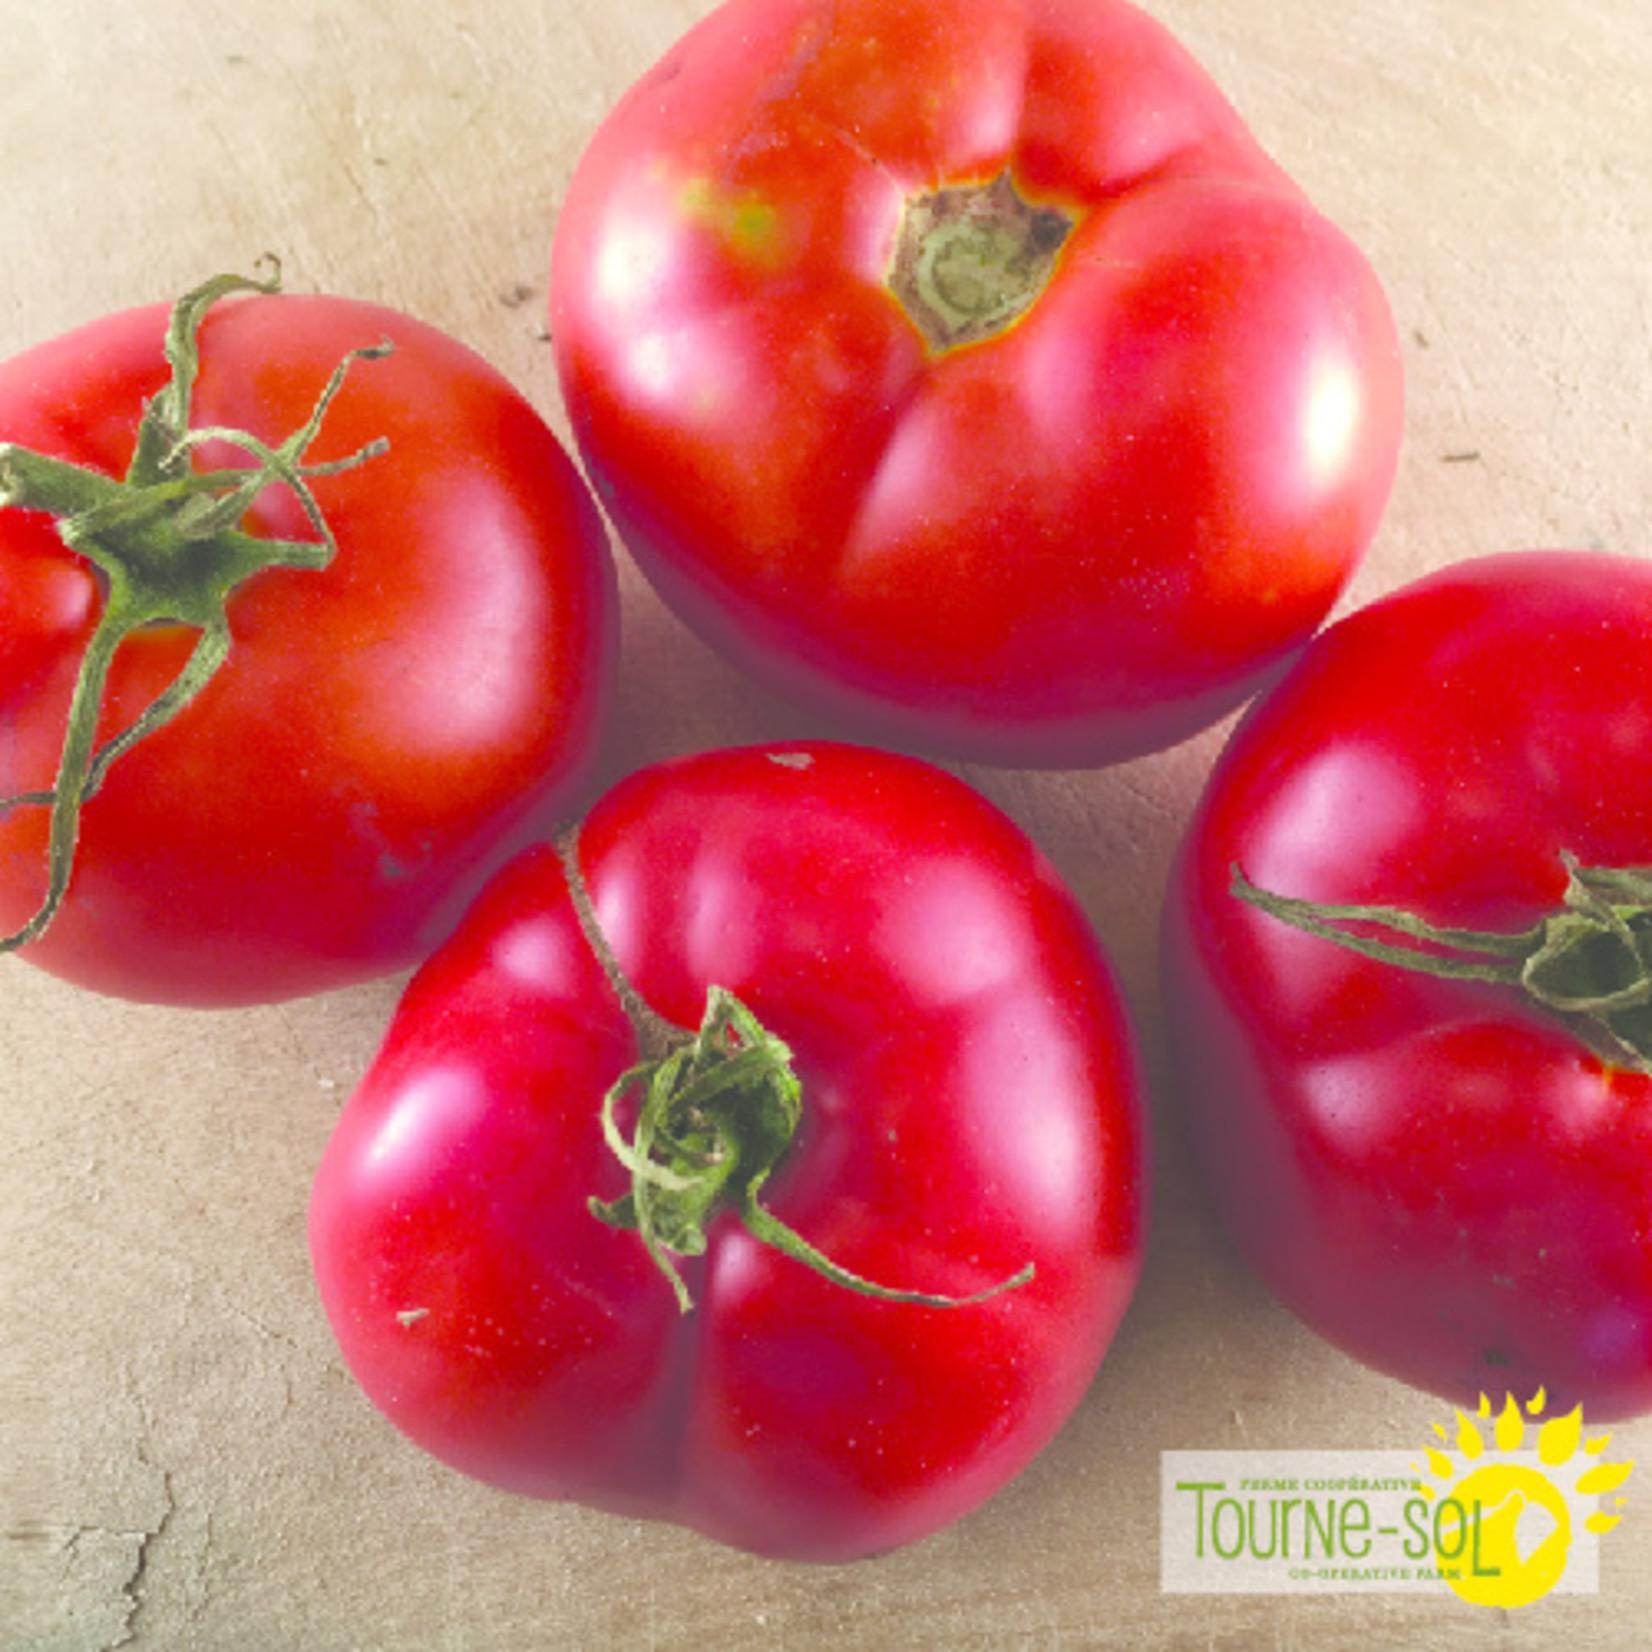 Tourne-Sol Montreal Tasty red tomato